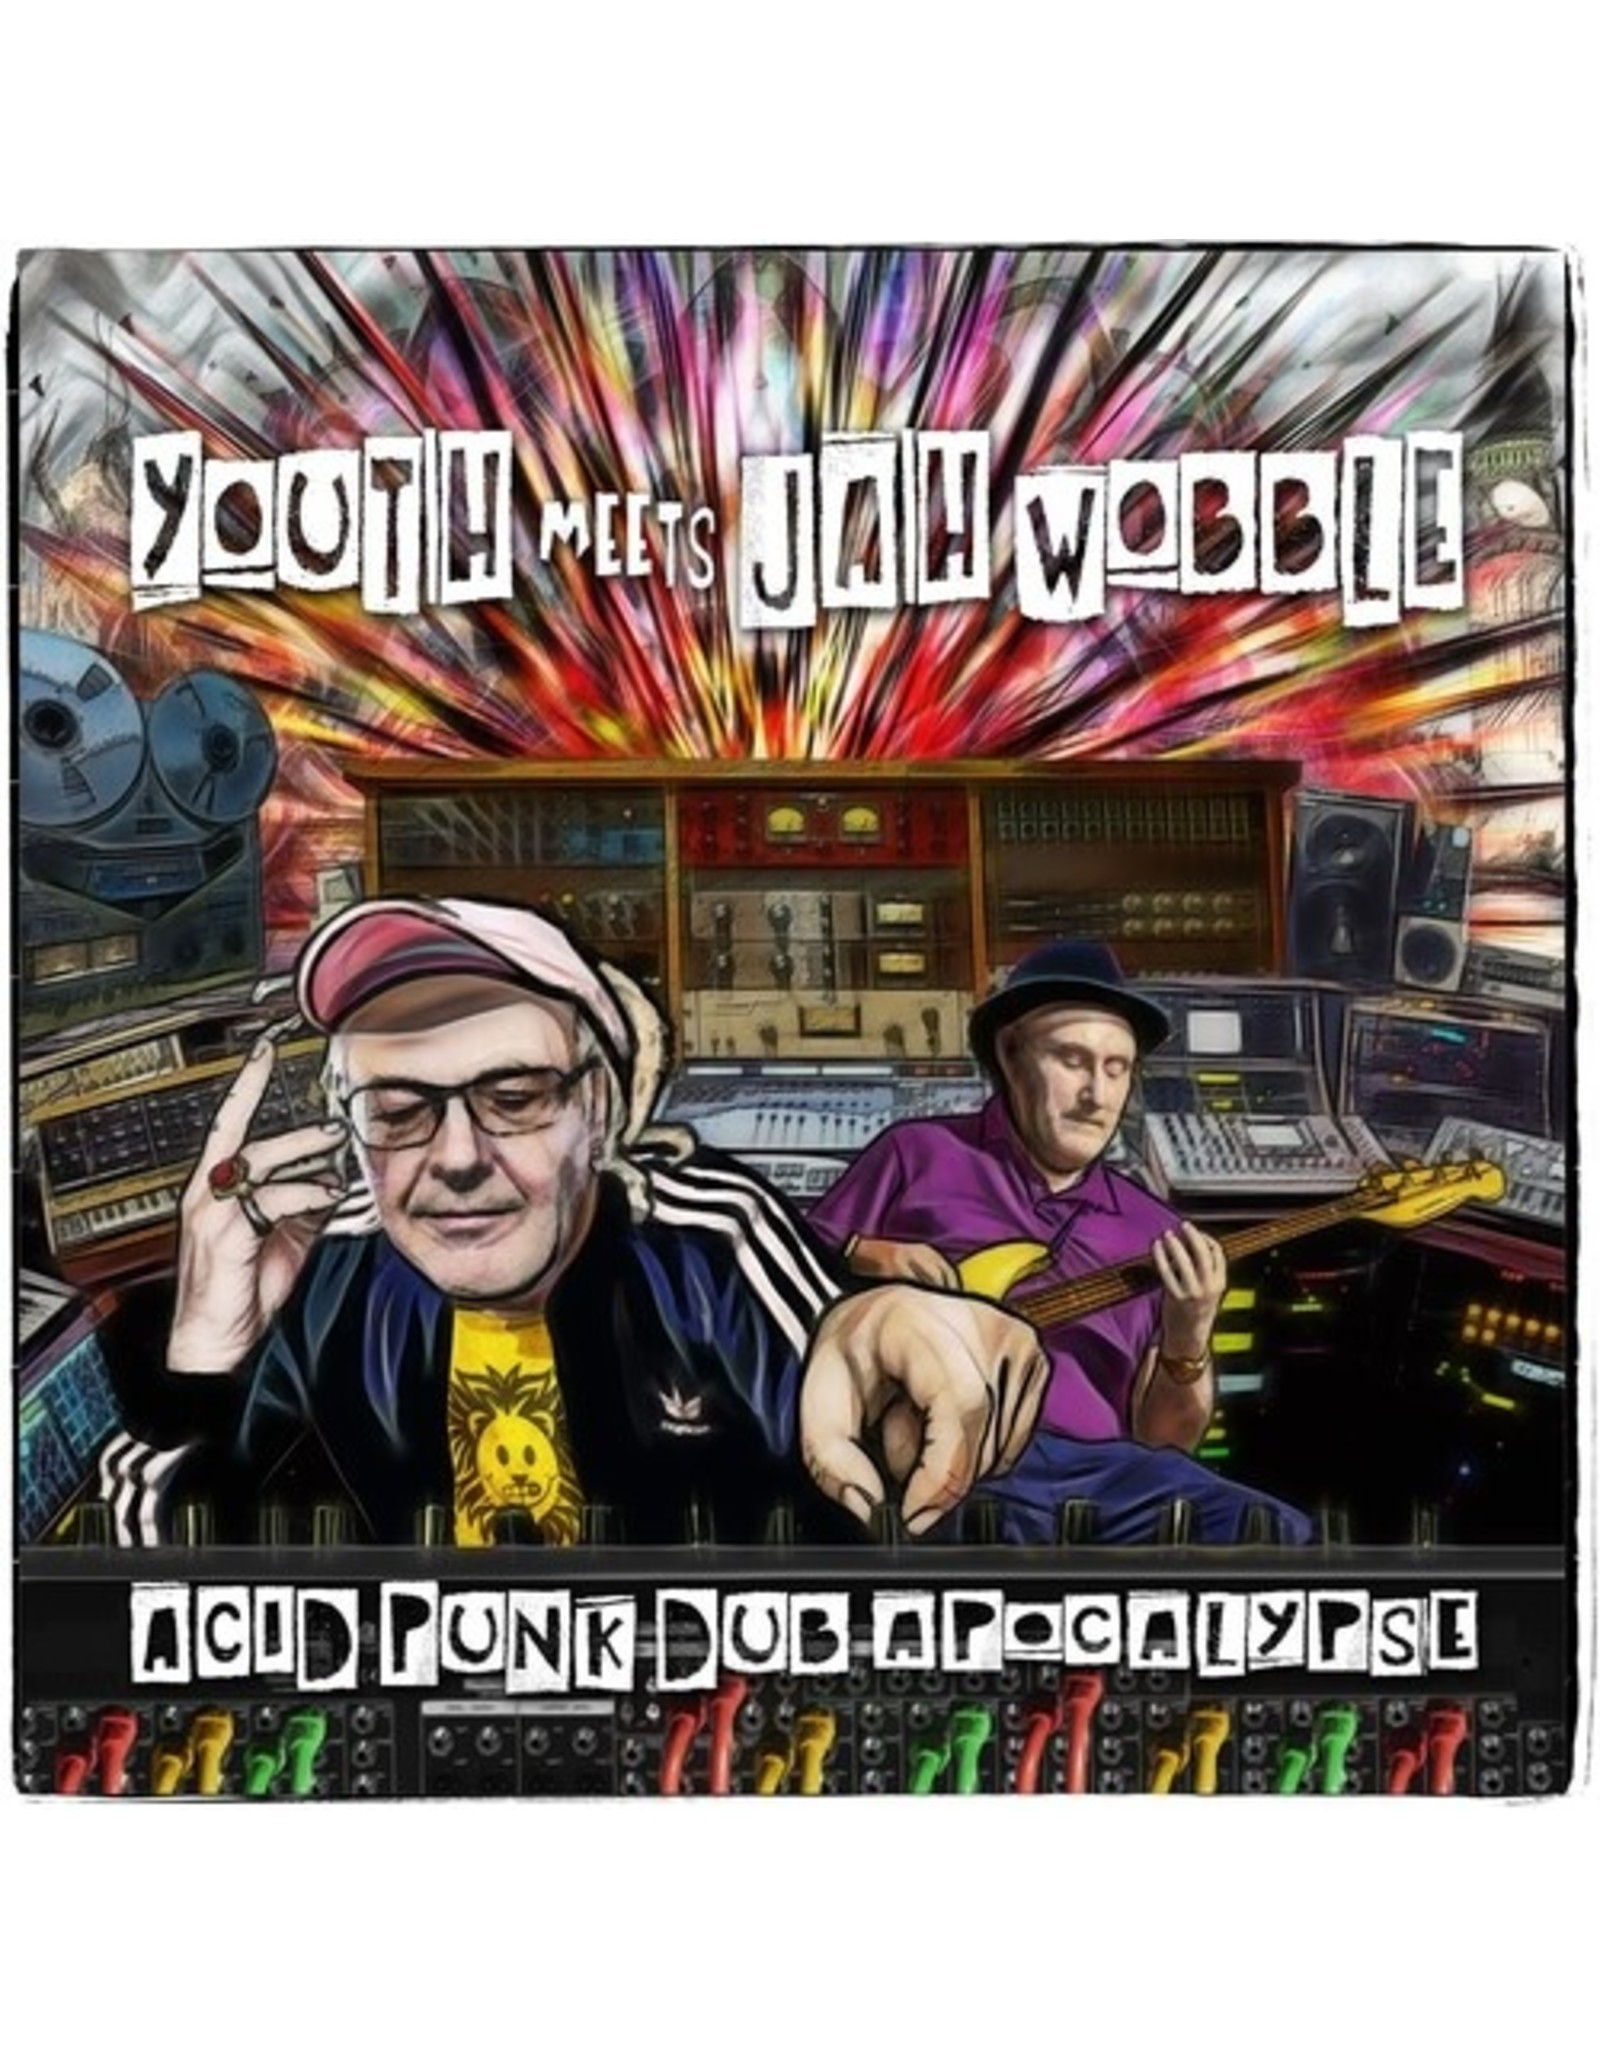 New Vinyl Youth Meets Jah Wobble - Acid Punk Dub Apocalypse LP